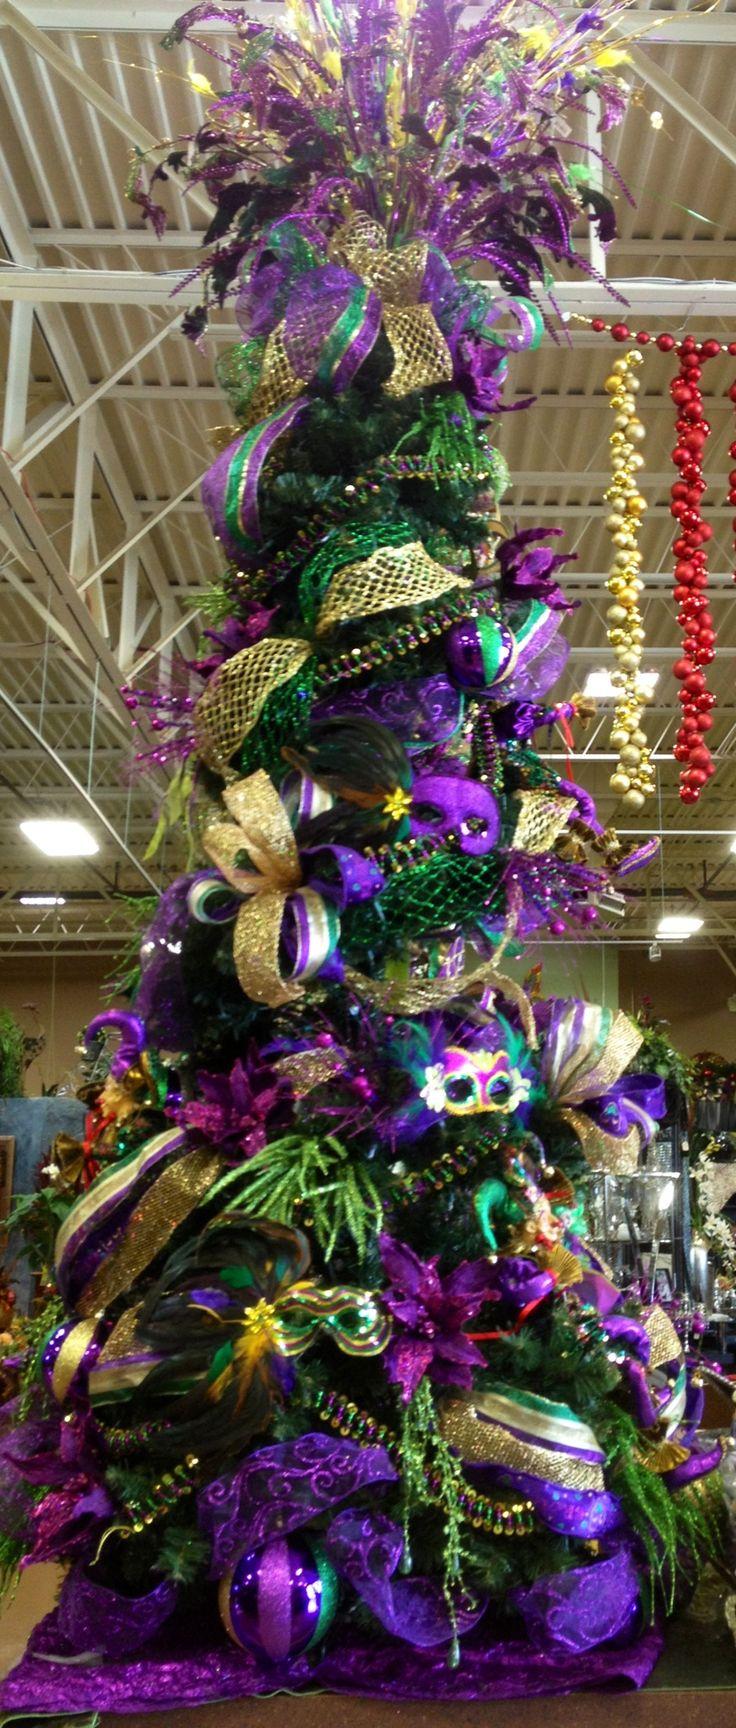 Christmas tree decorations purple silver - Purple Christmas Trees